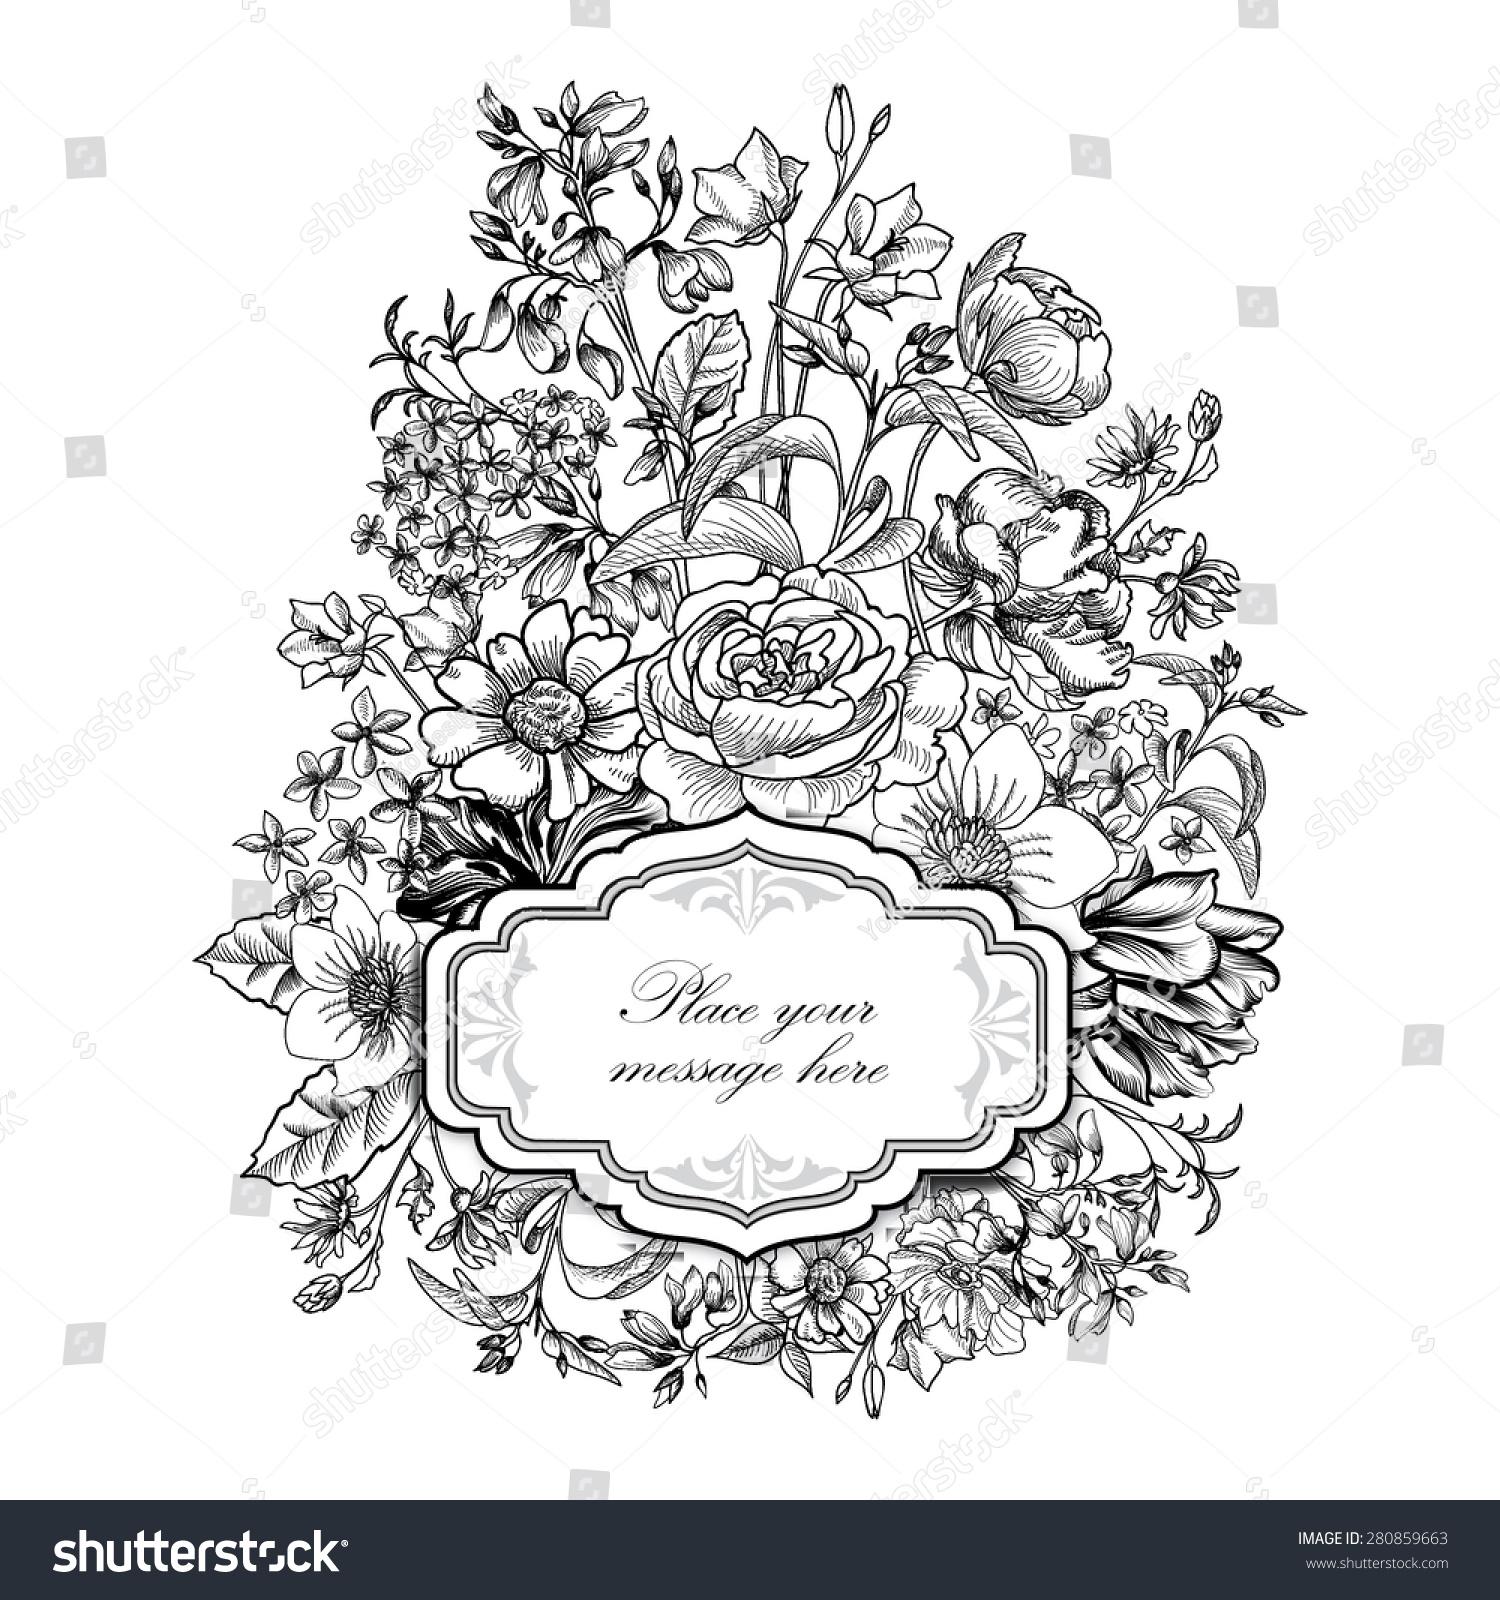 Vintage Floral Border Flourish Background Victorian Style Invitation 280859663